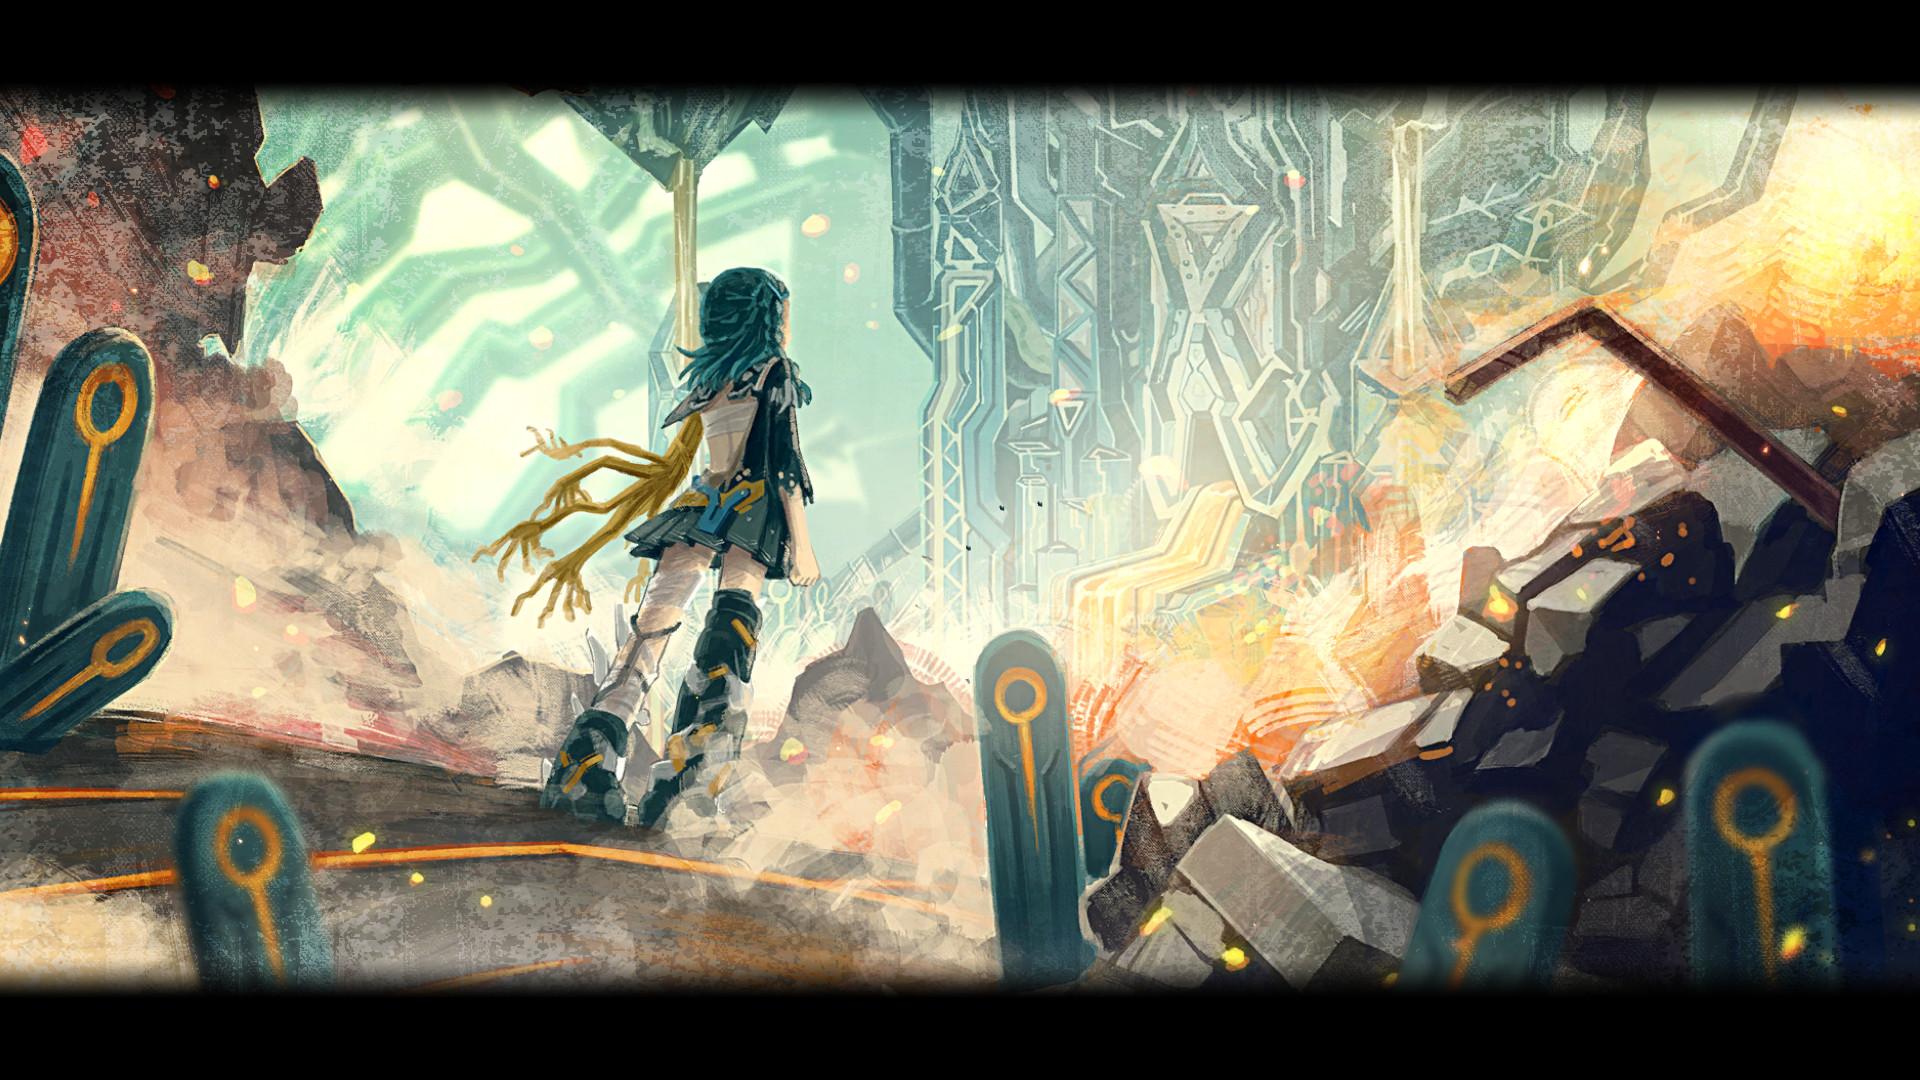 Good Anime Wallpaper Game Freak S Latest Non Pokemon Game Giga Wrecker Enters